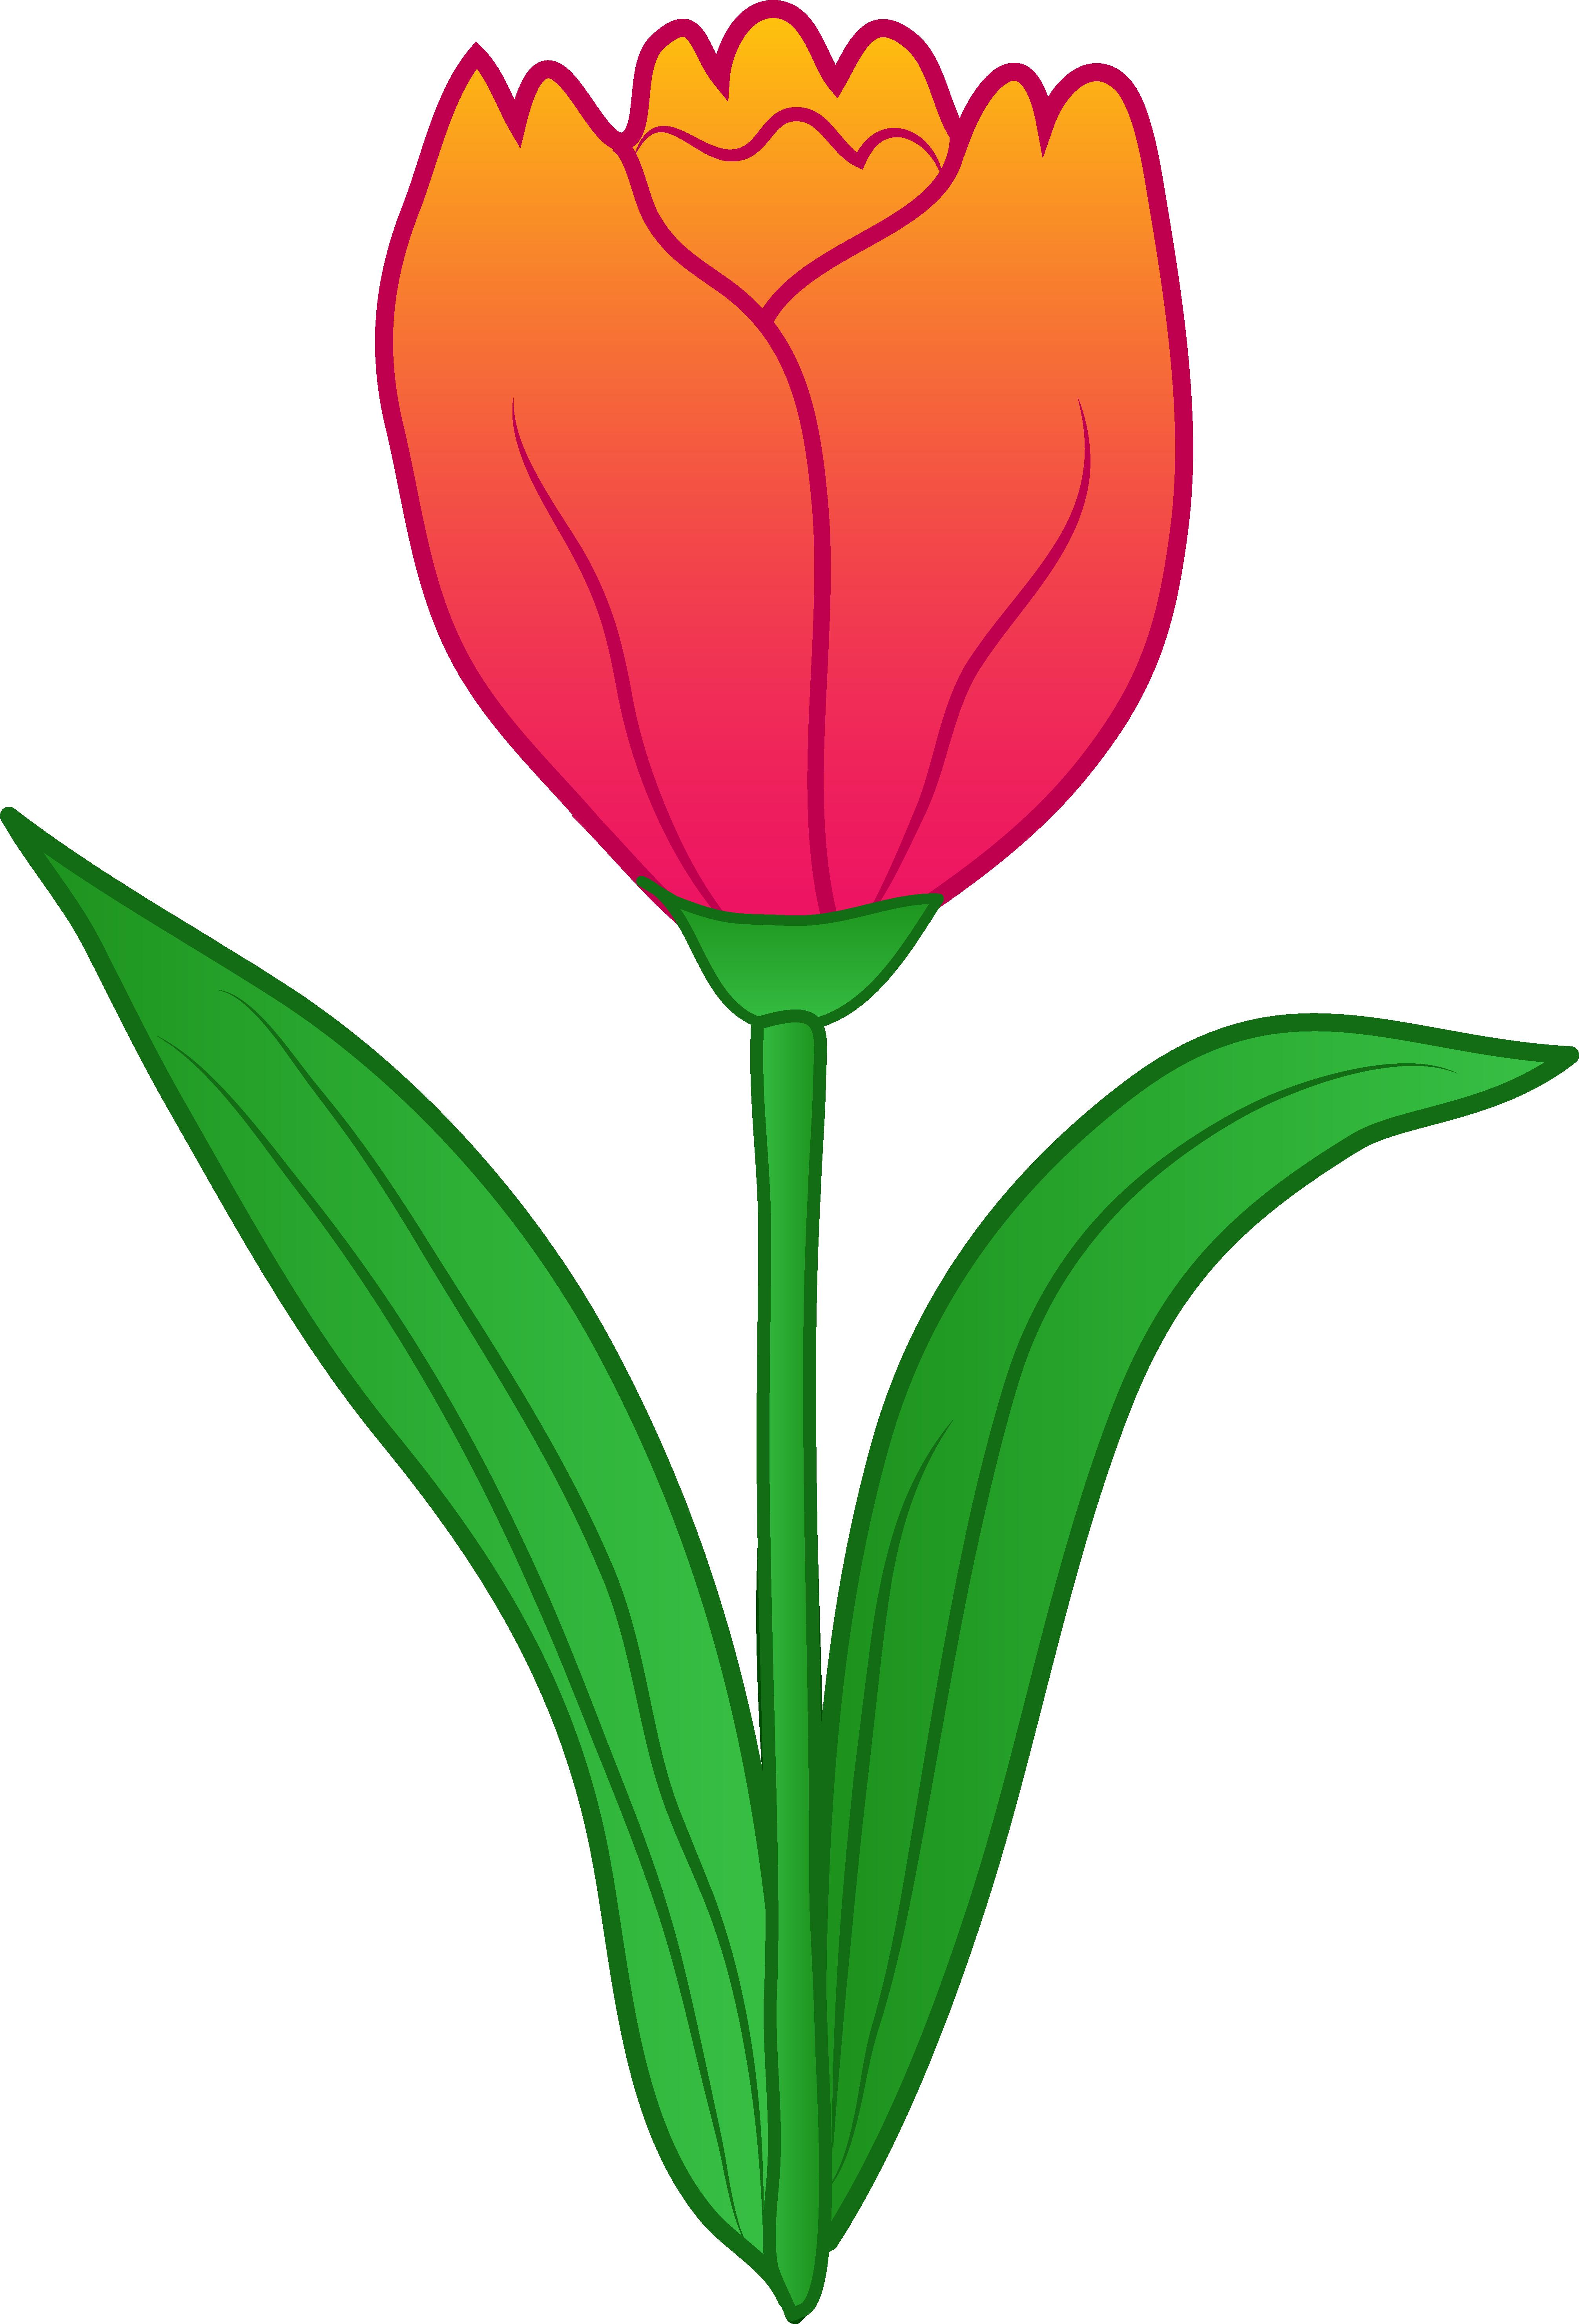 4024x5921 Top 76 Tulip Flower Clip Art